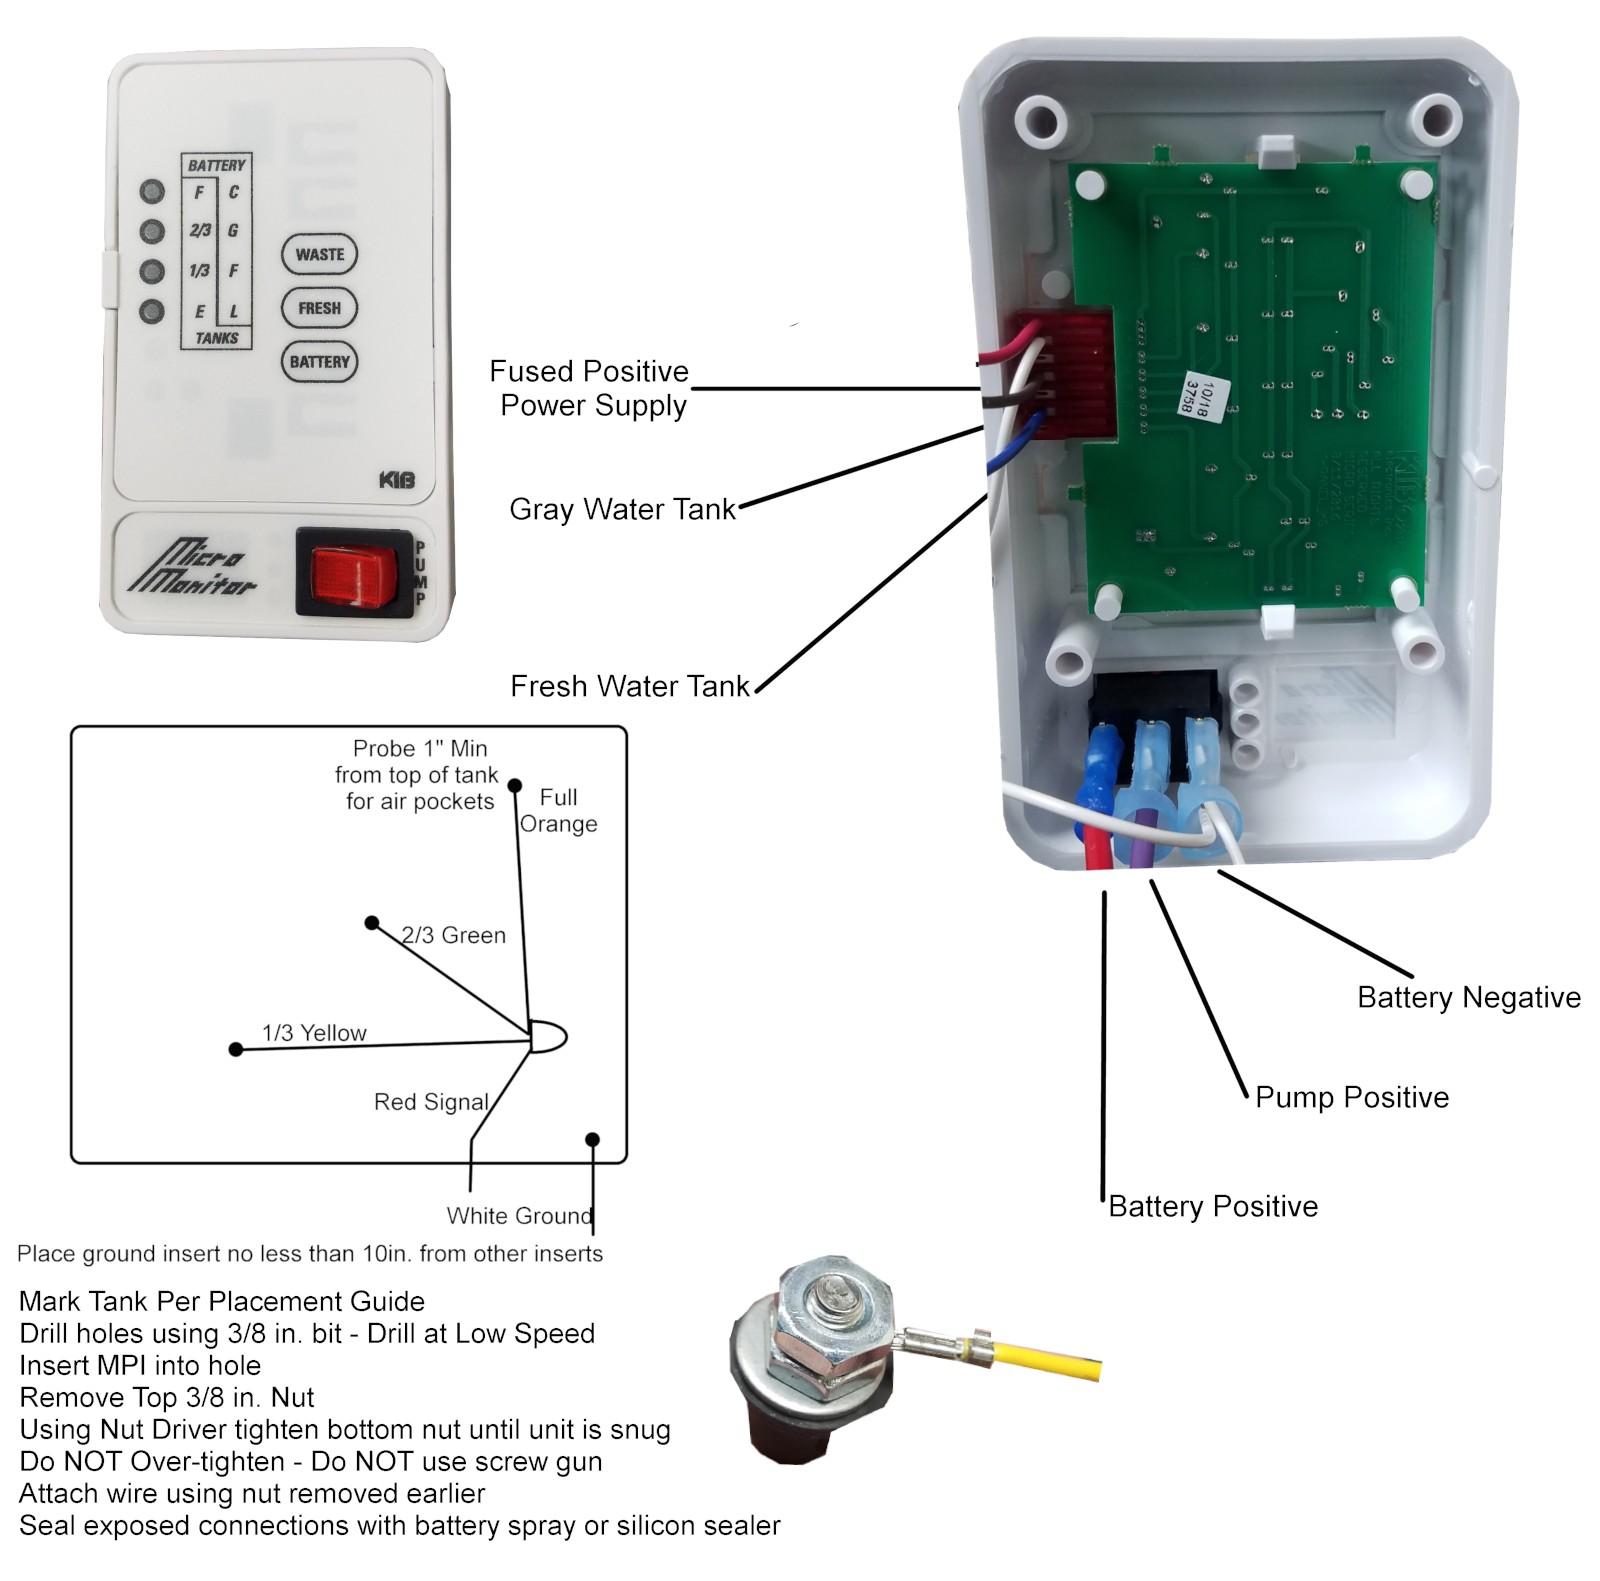 Kib Micro Monitor Manual Kib 2 Tank Monitor Panel 12 Volt White Face Plate Of Kib Micro Monitor Manual